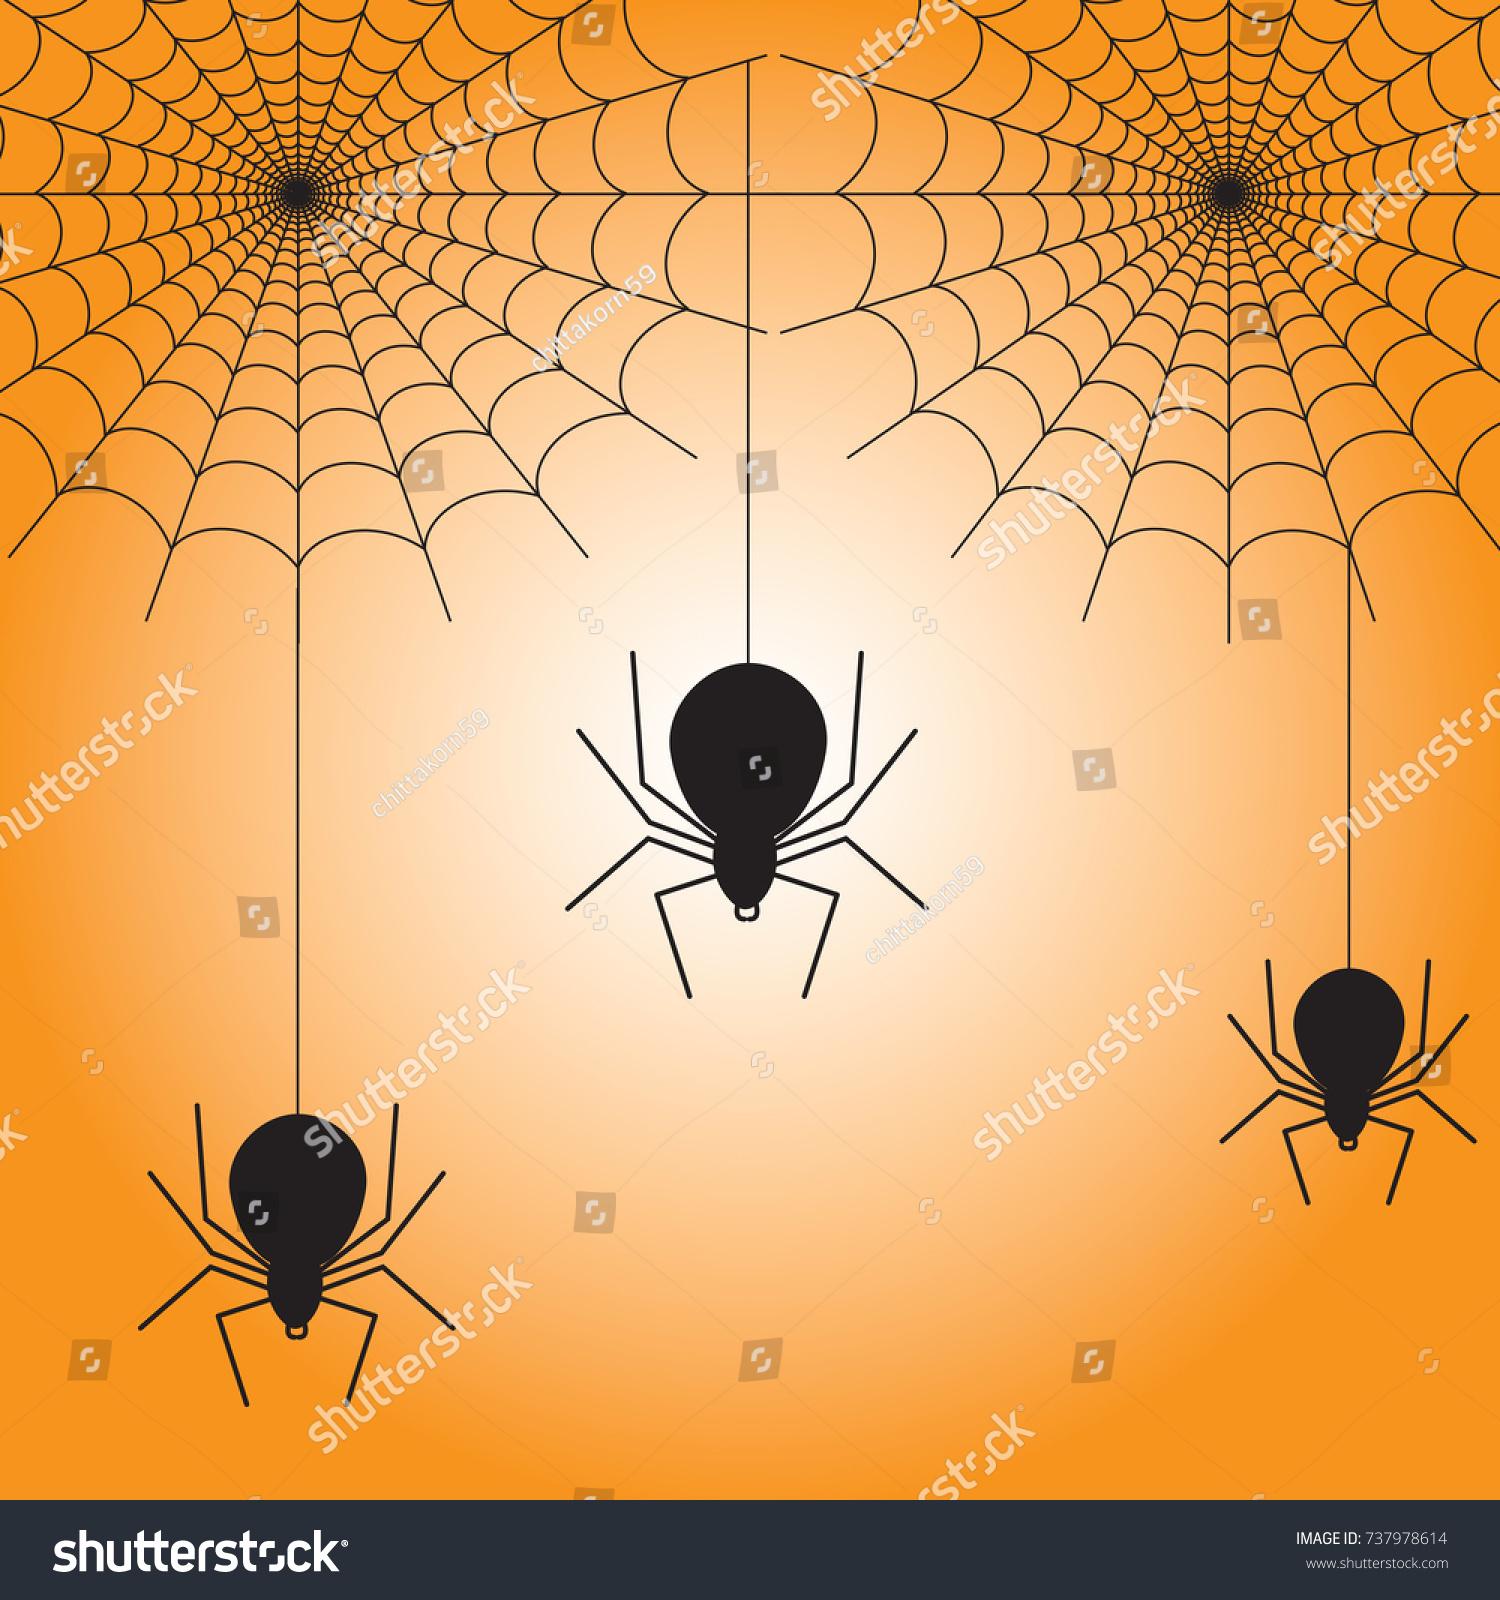 Good Wallpaper Halloween Spider - stock-vector-spiderweb-and-three-spiders-for-halloween-wallpaper-making-737978614  Gallery_233415.jpg